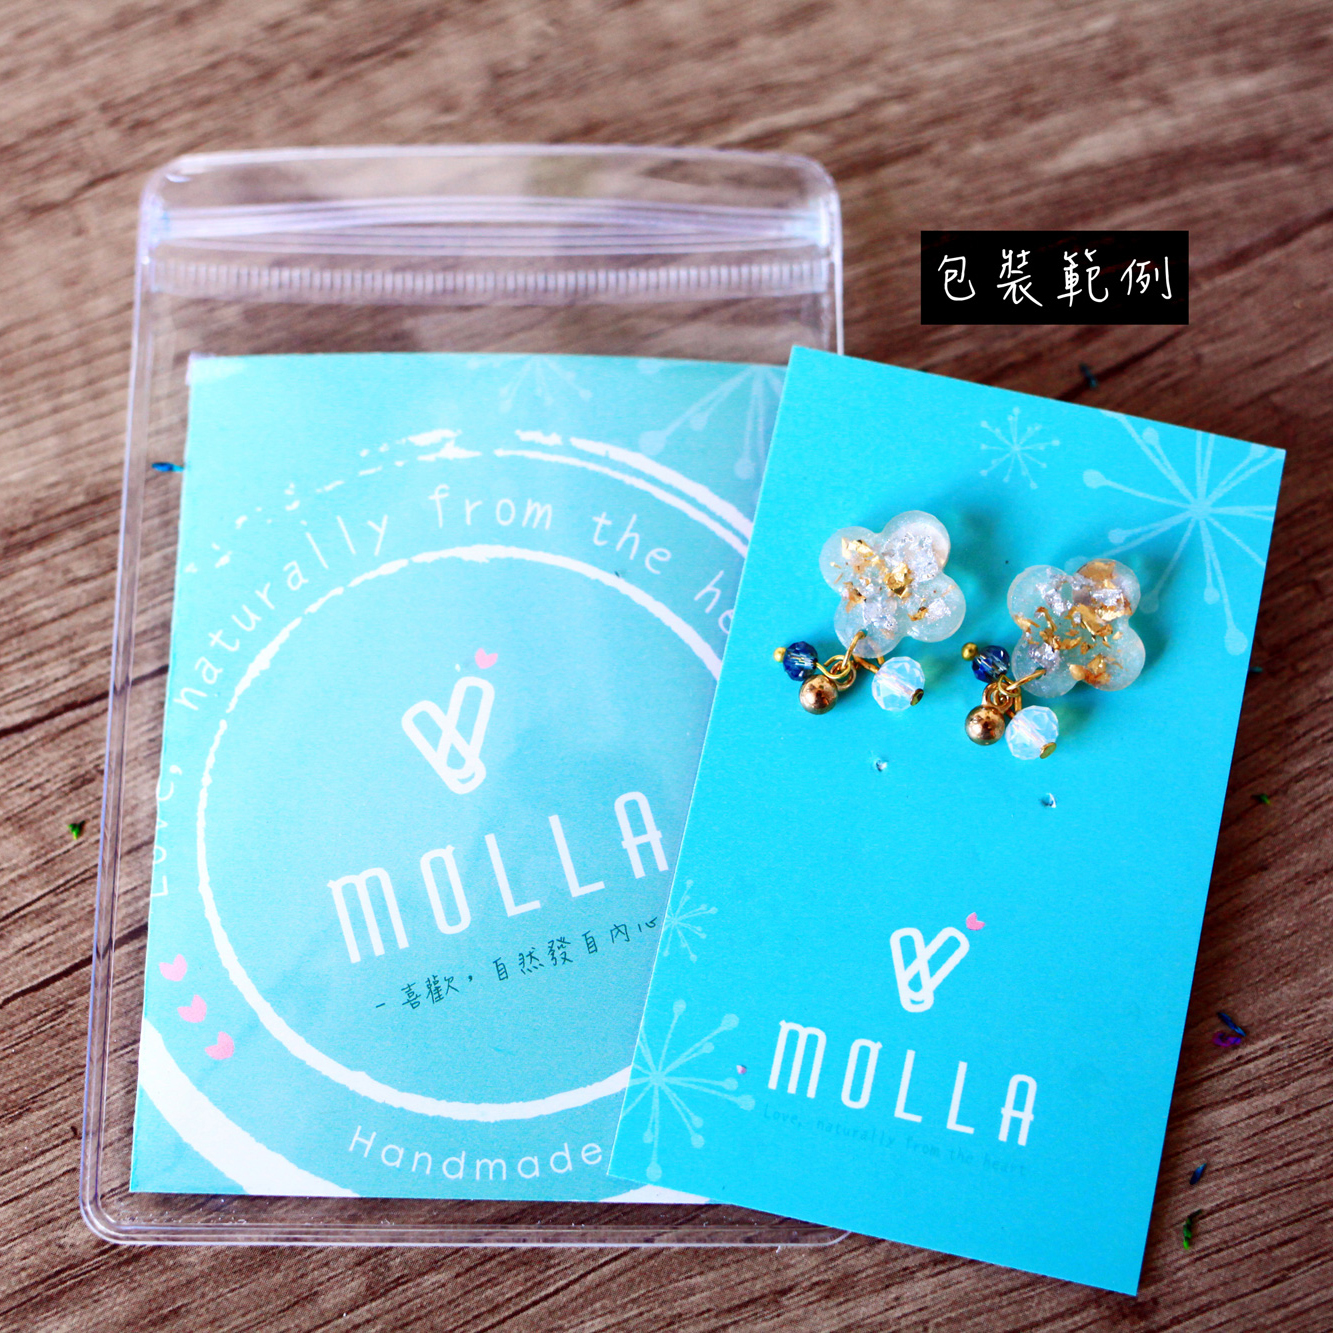 Molla X idecor 好想吹吹風仙人掌吊飾(女生最愛手作吊飾、鑰匙圈)